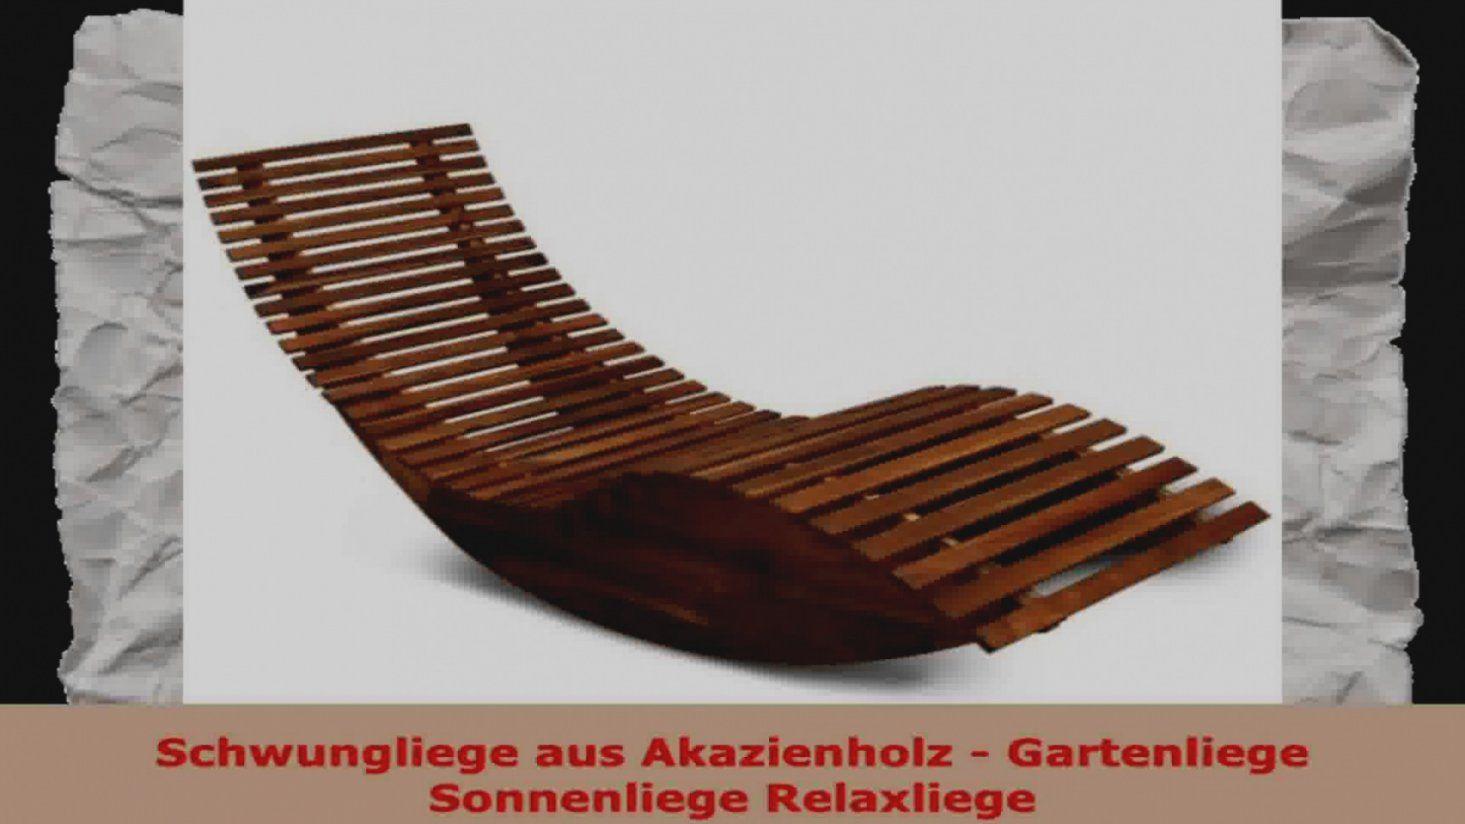 Wunderbare gartenliege selber bauen schwungliege aus akazienholz von gartenliege selber bauen - Gartenliege selber bauen aus paletten ...